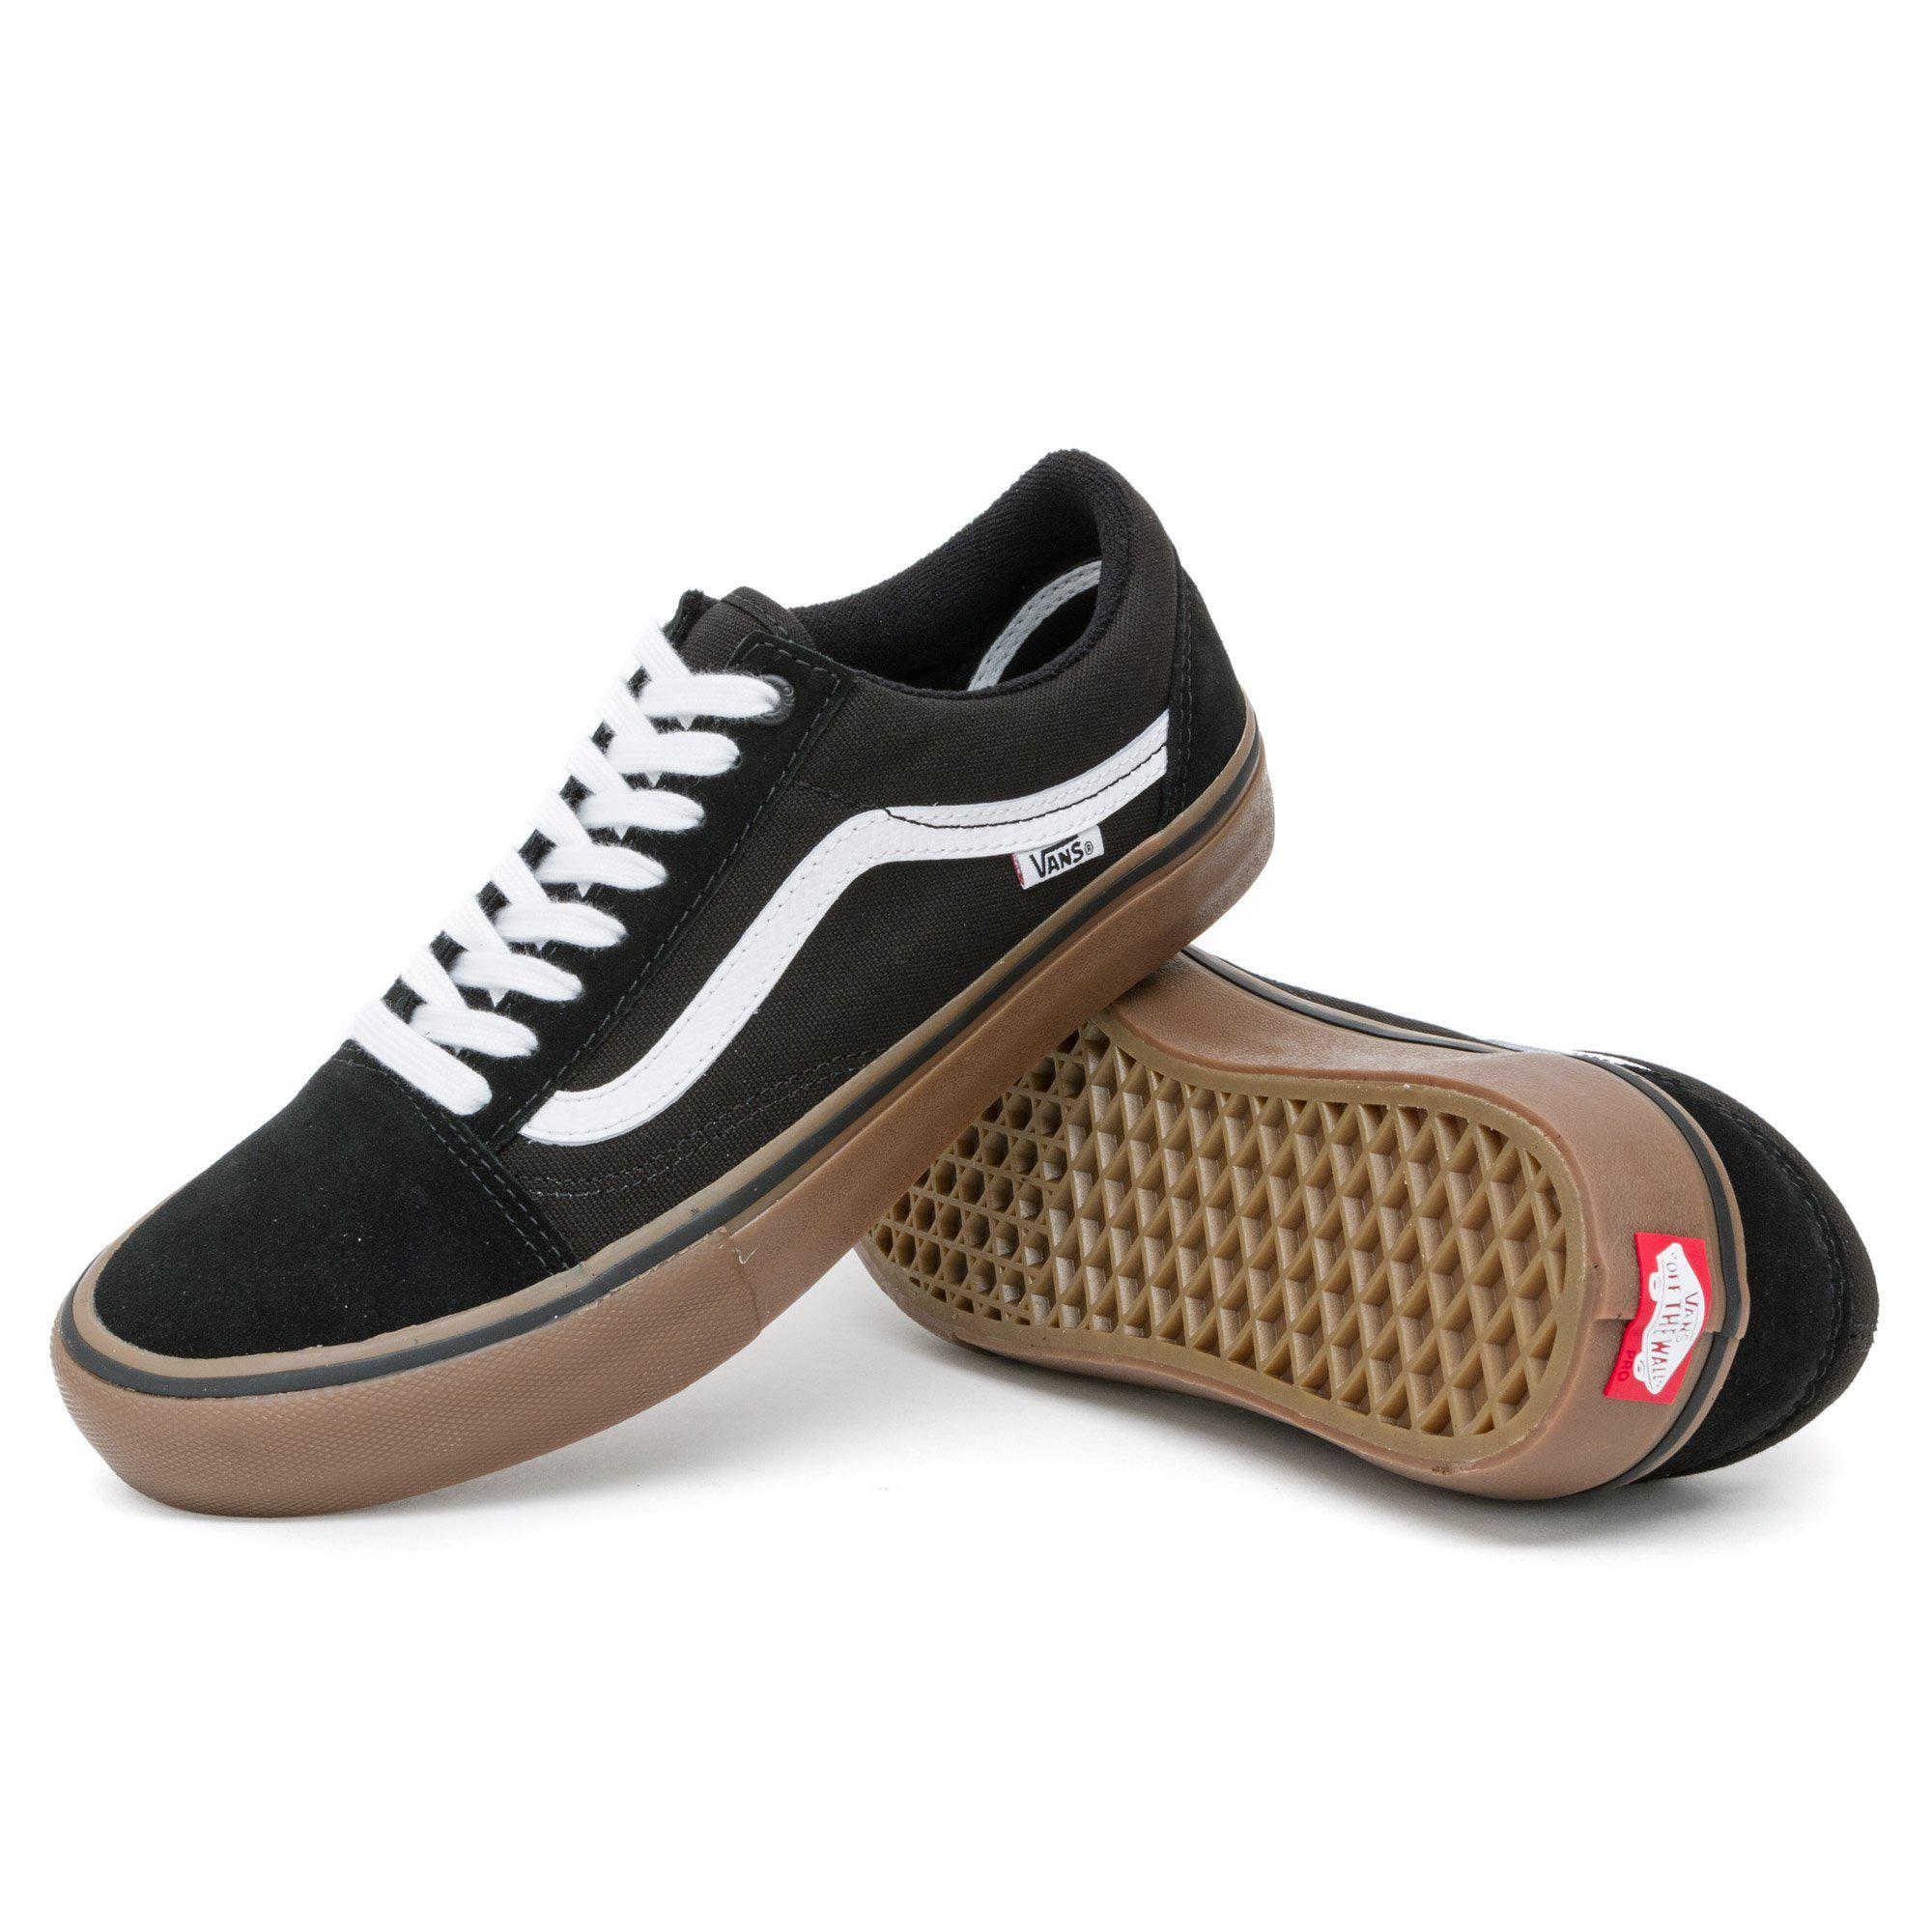 b827de5cdf Vans - Black Old Skool Pro Shoes for Men - Lyst. View fullscreen